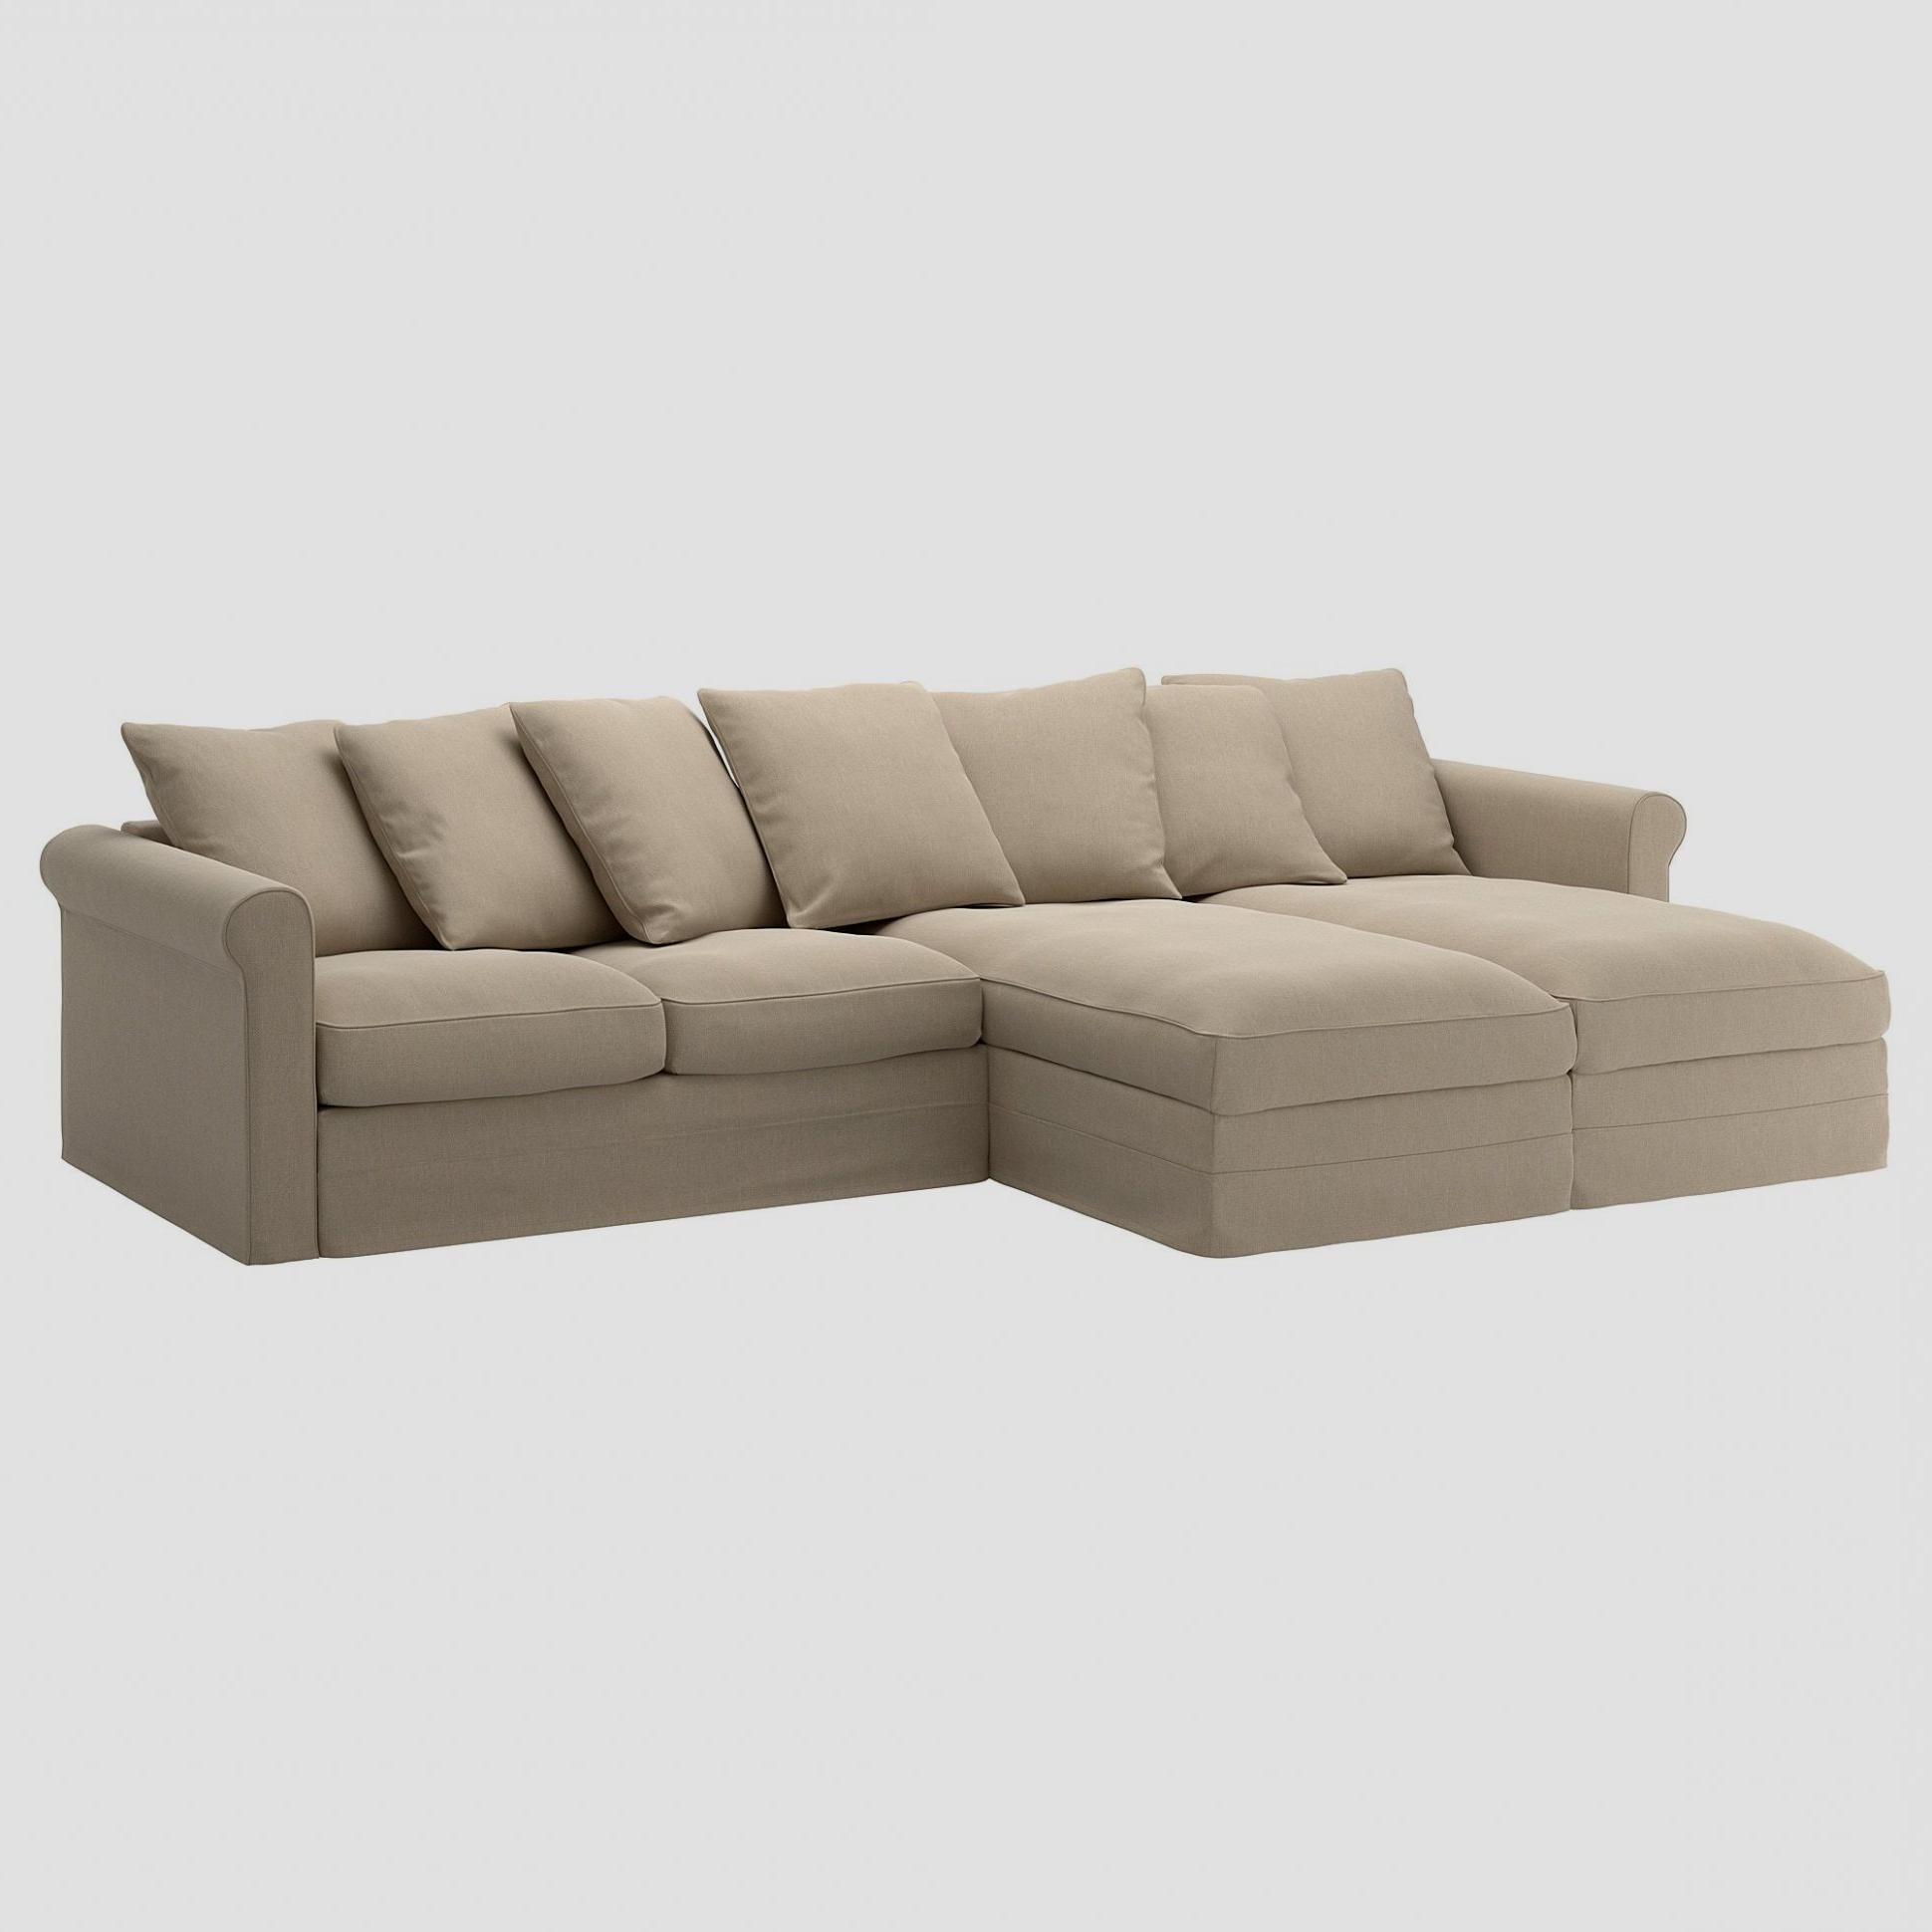 Sofas Modulares Ikea Budm sofas Rinconeras Modulares Magnifico sofa Ikea Leder Busco